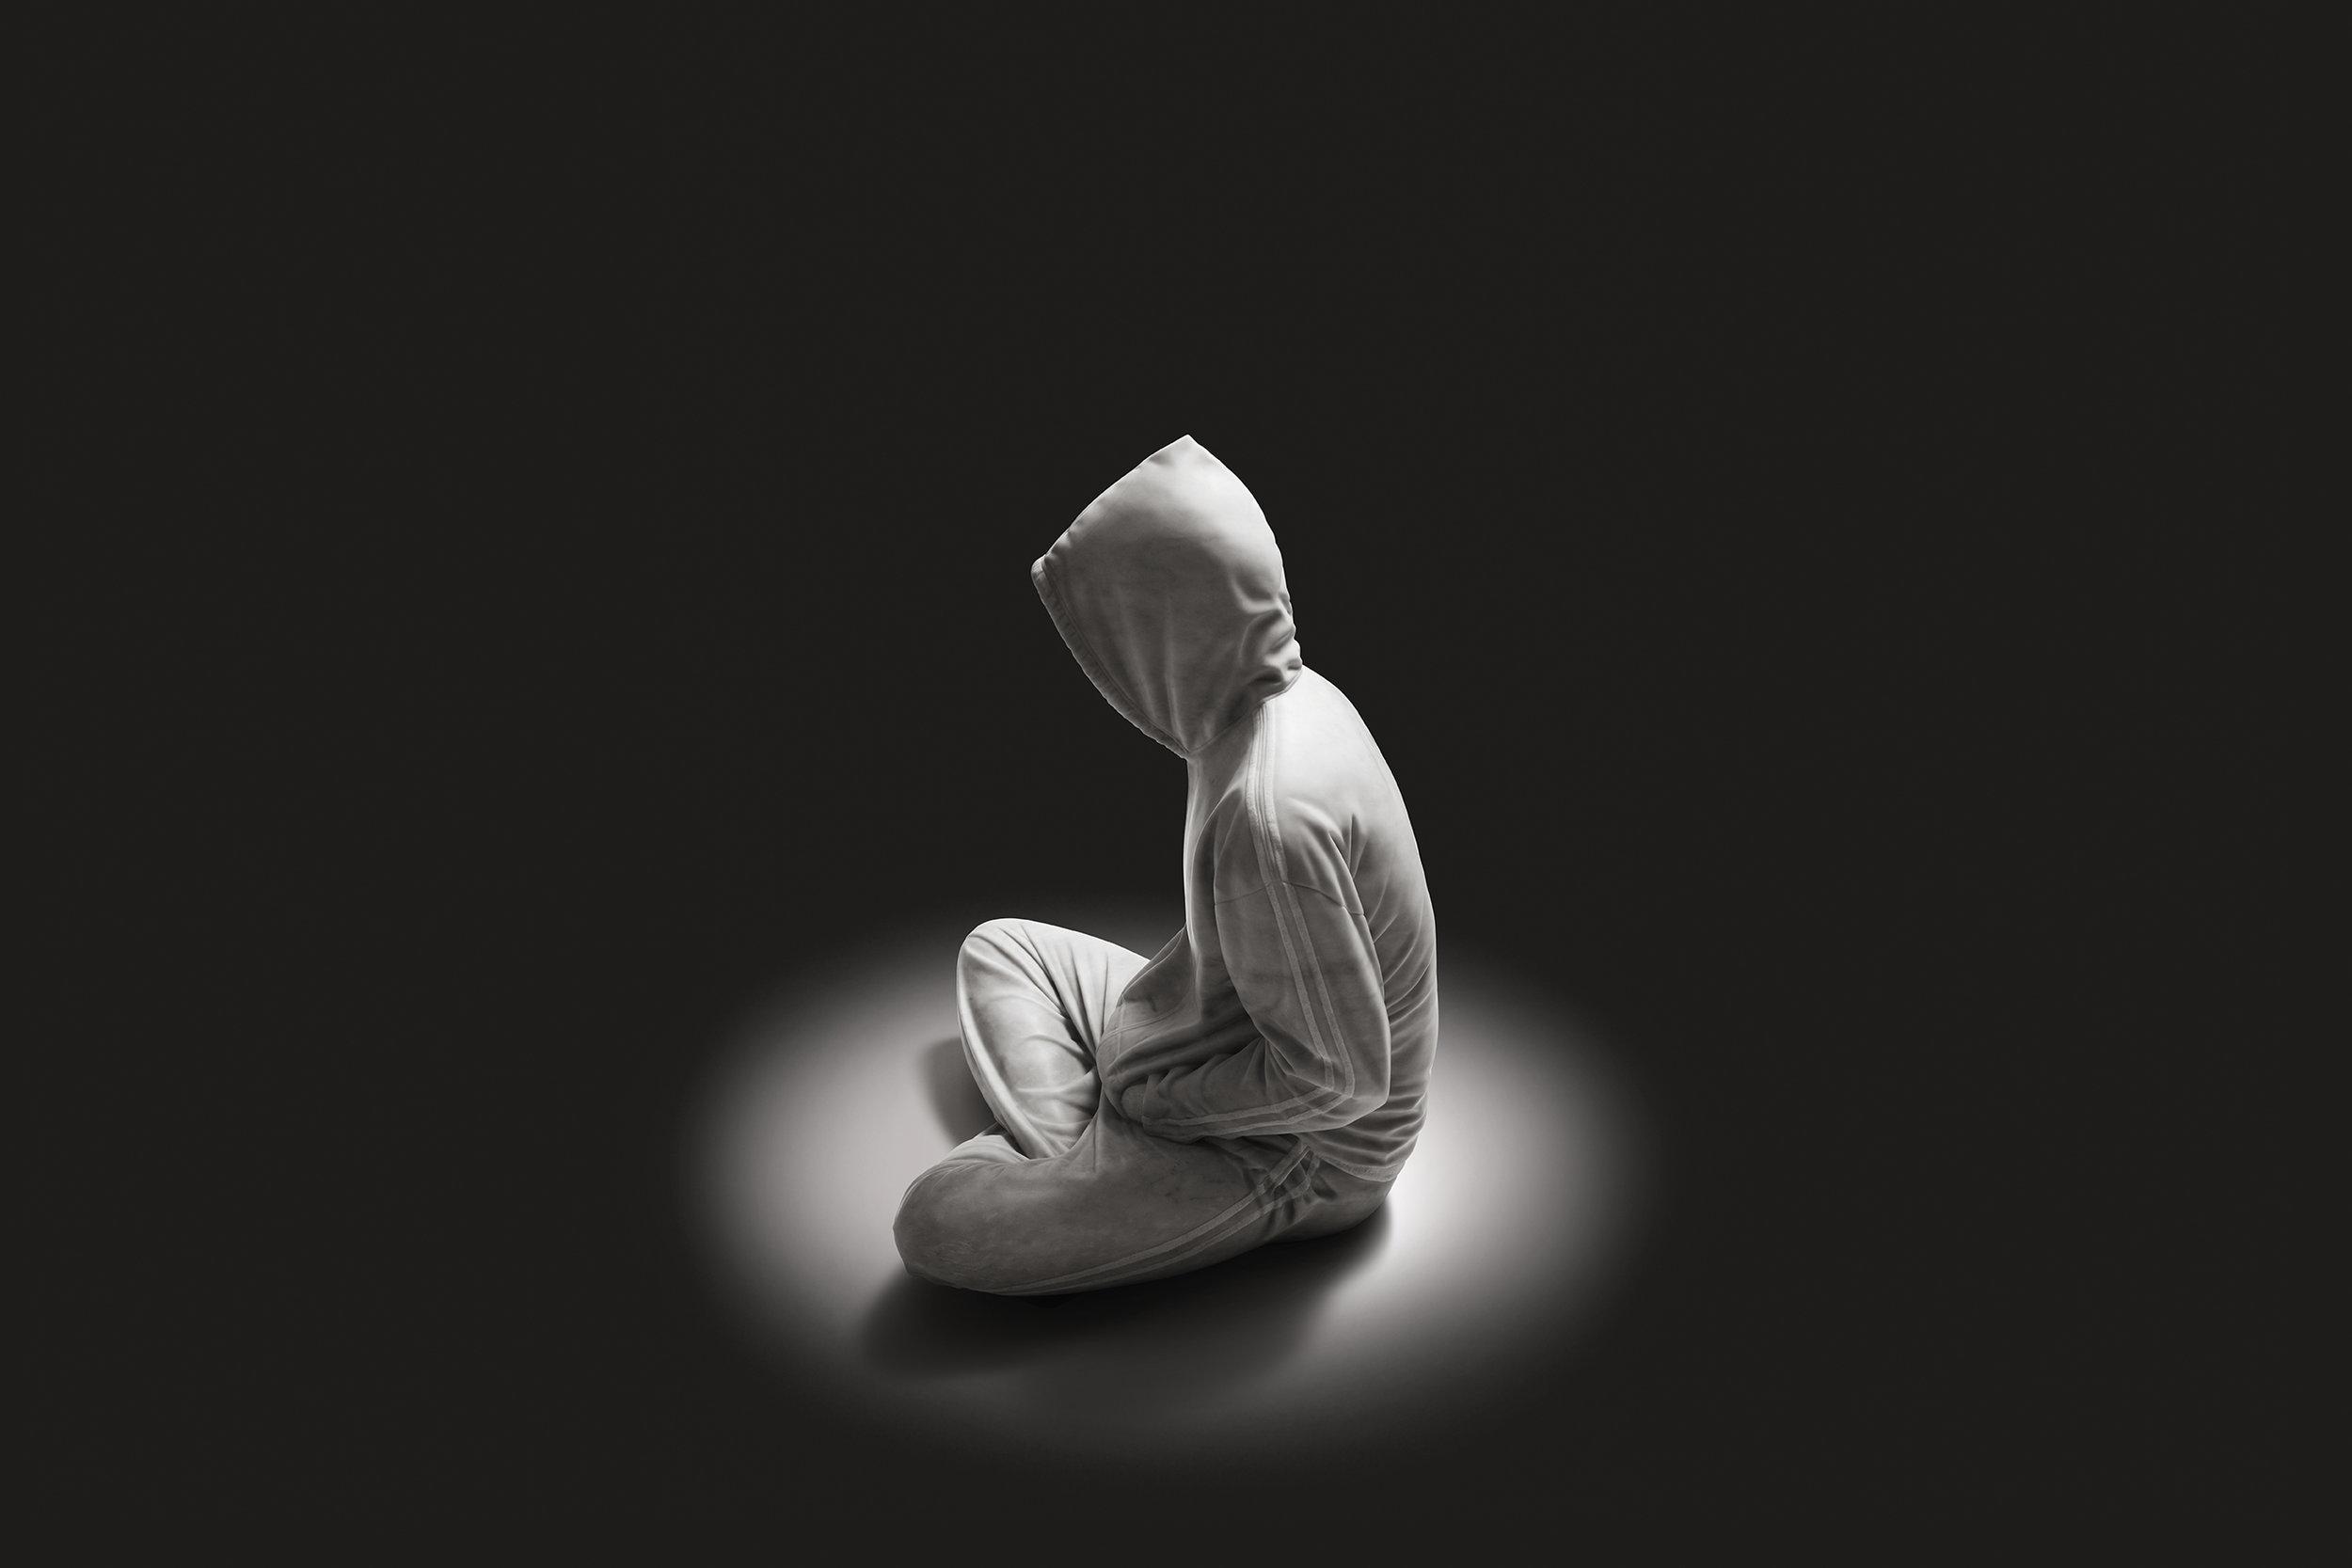 07 Alex Seton_The Soloist_May2012_ABHK12_marble.jpg